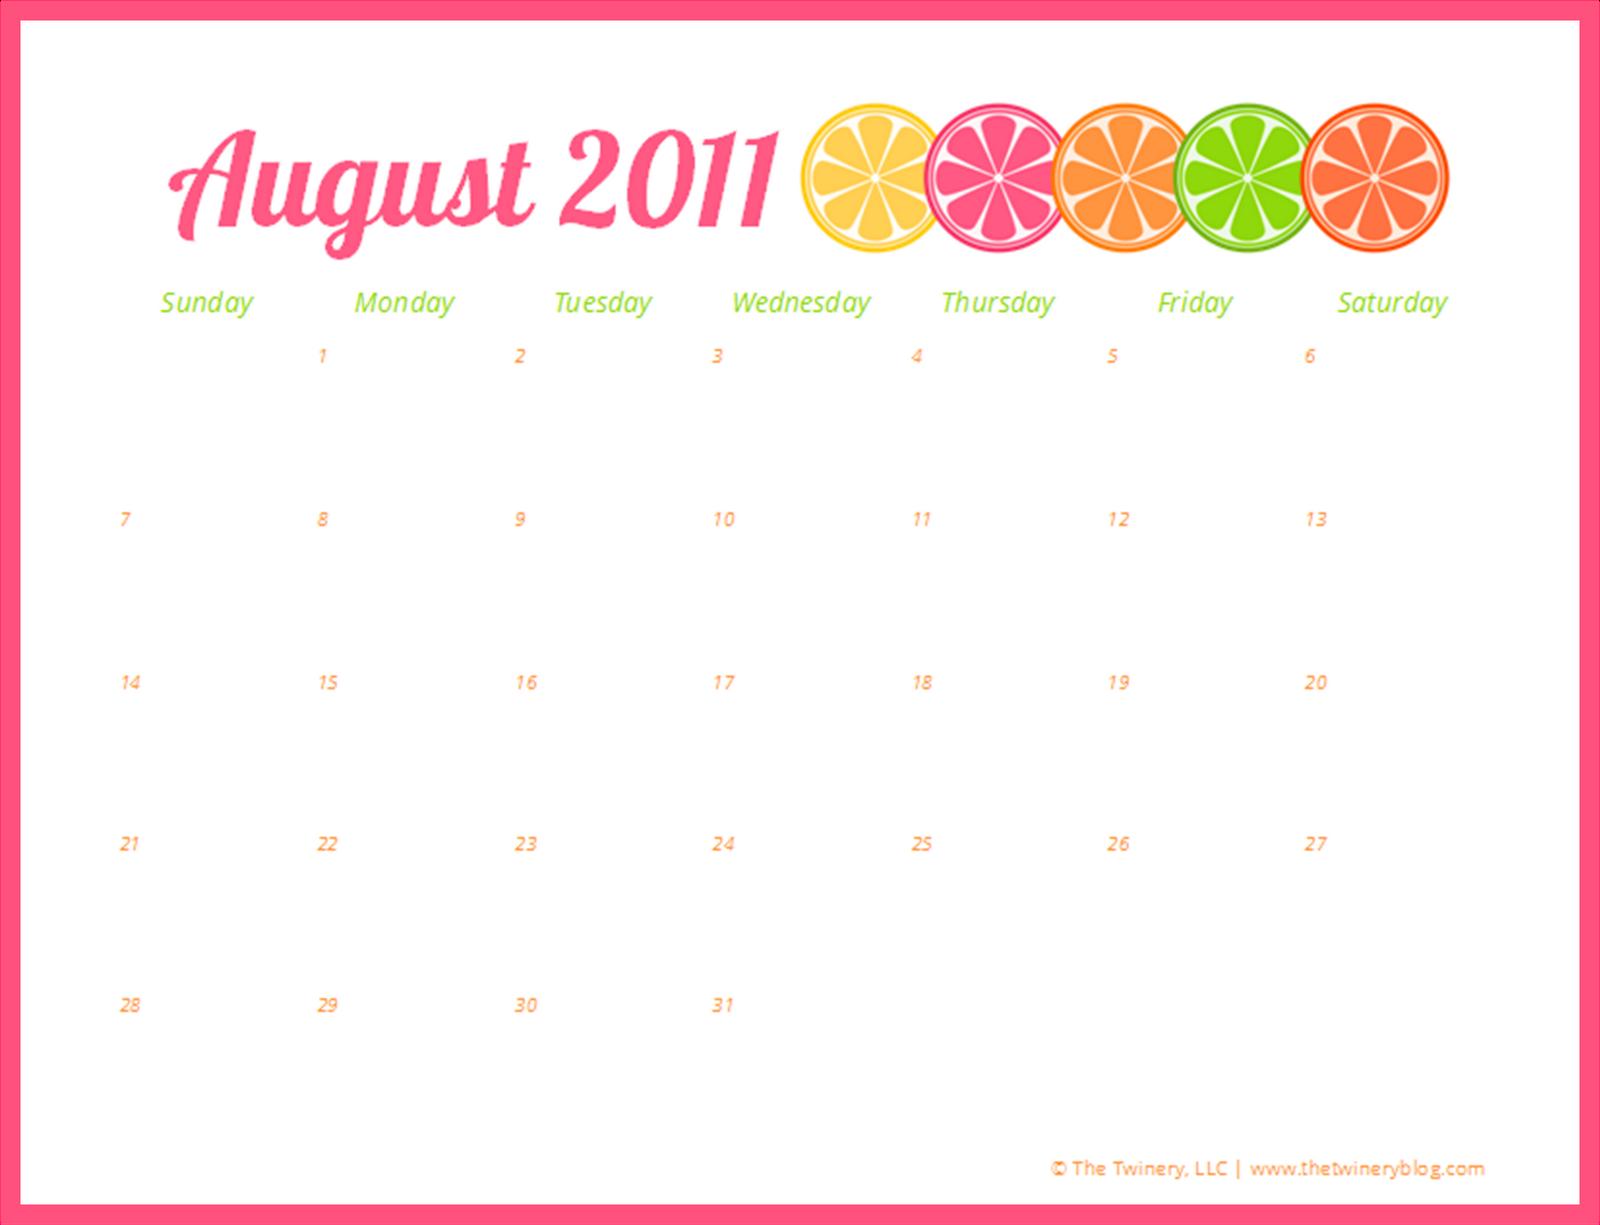 http://1.bp.blogspot.com/-XJBttsy-giI/Ti7gwWOPAYI/AAAAAAAAAYk/62jj4-ewC40/s1600/August%202011.png